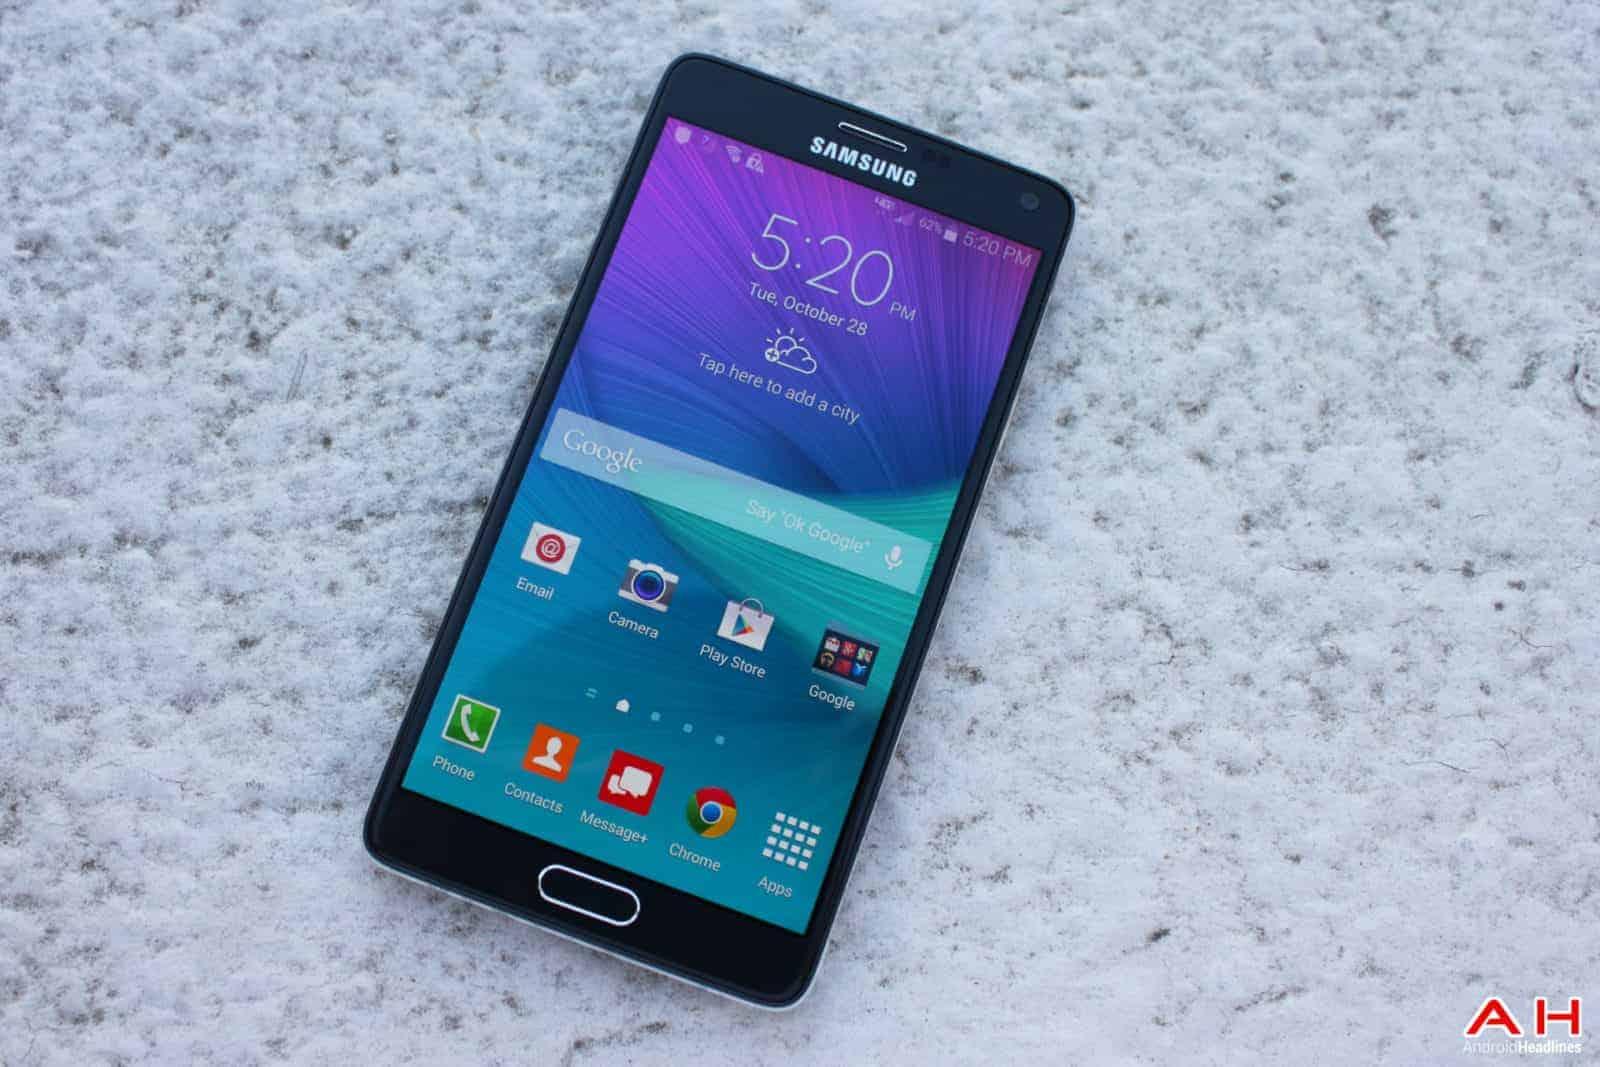 AH Samsung Galaxy Note 4-22